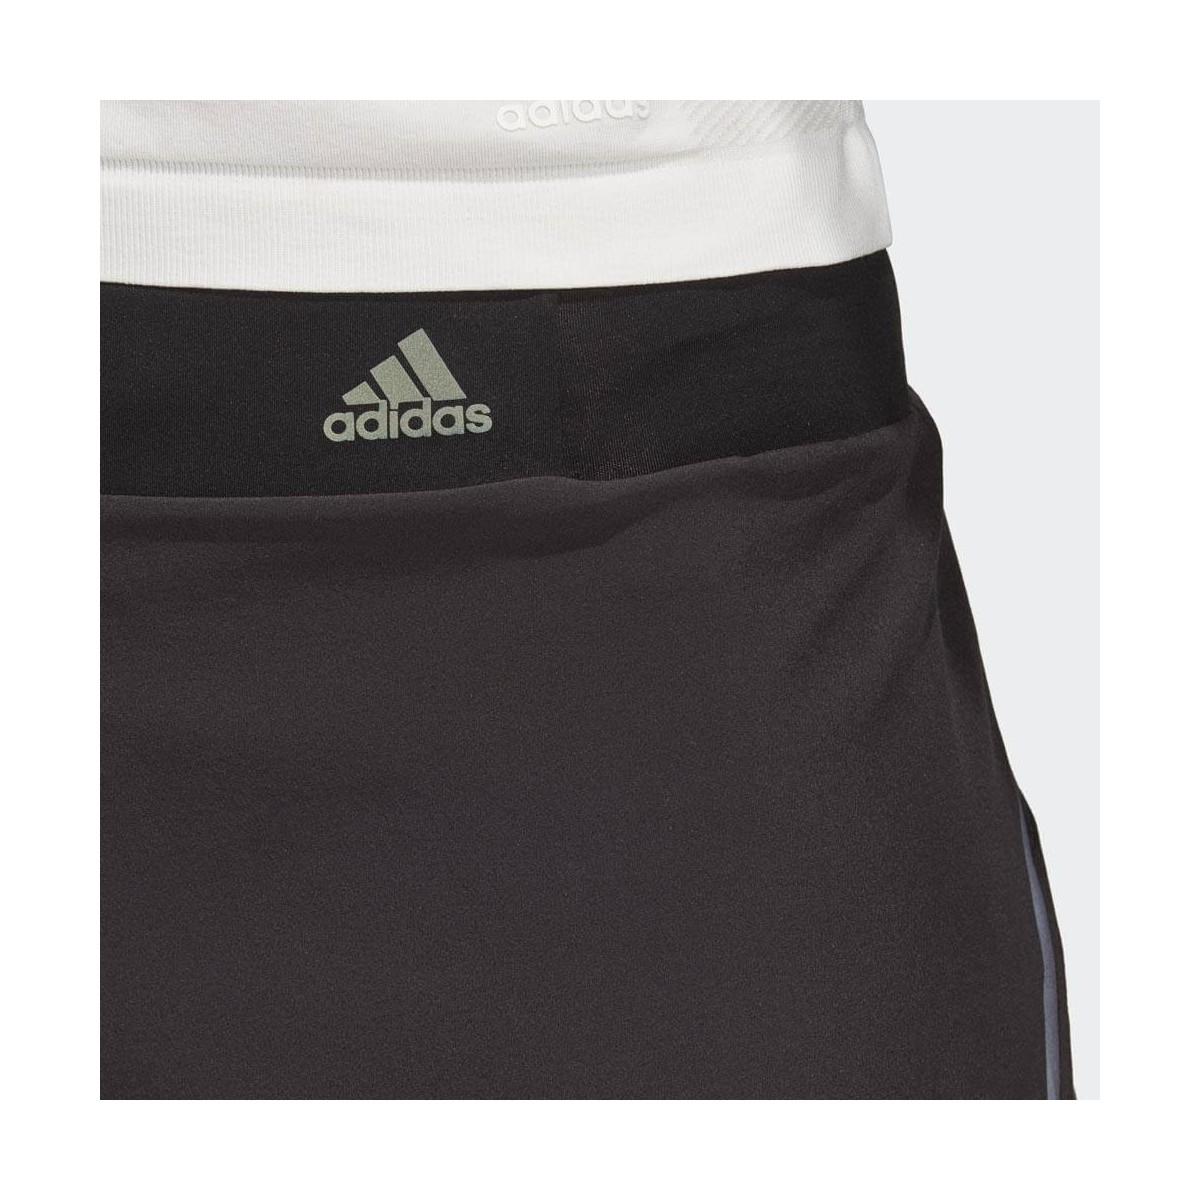 33f2052e8 Pantalon corto runnning Adidas Saturady Short Mujer negro - 365 Rider